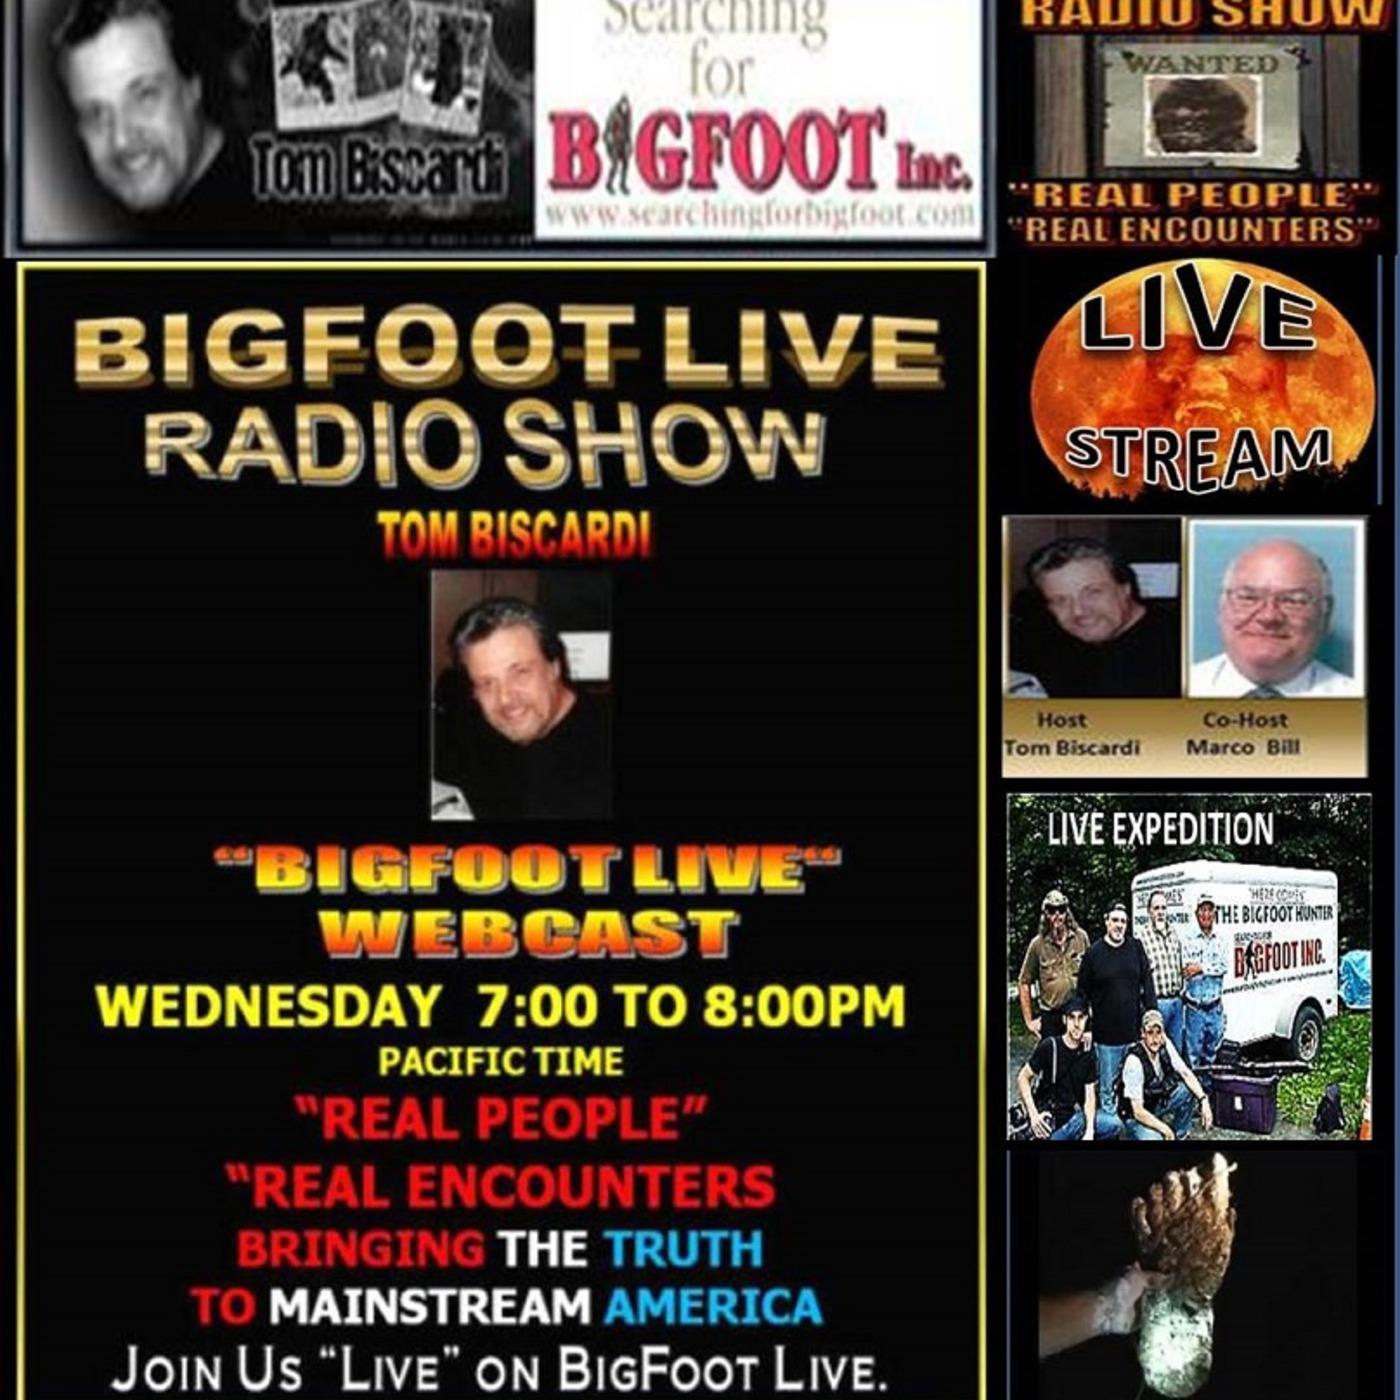 BIGFOOT LIVE RADIO 2016 ARCHIVES